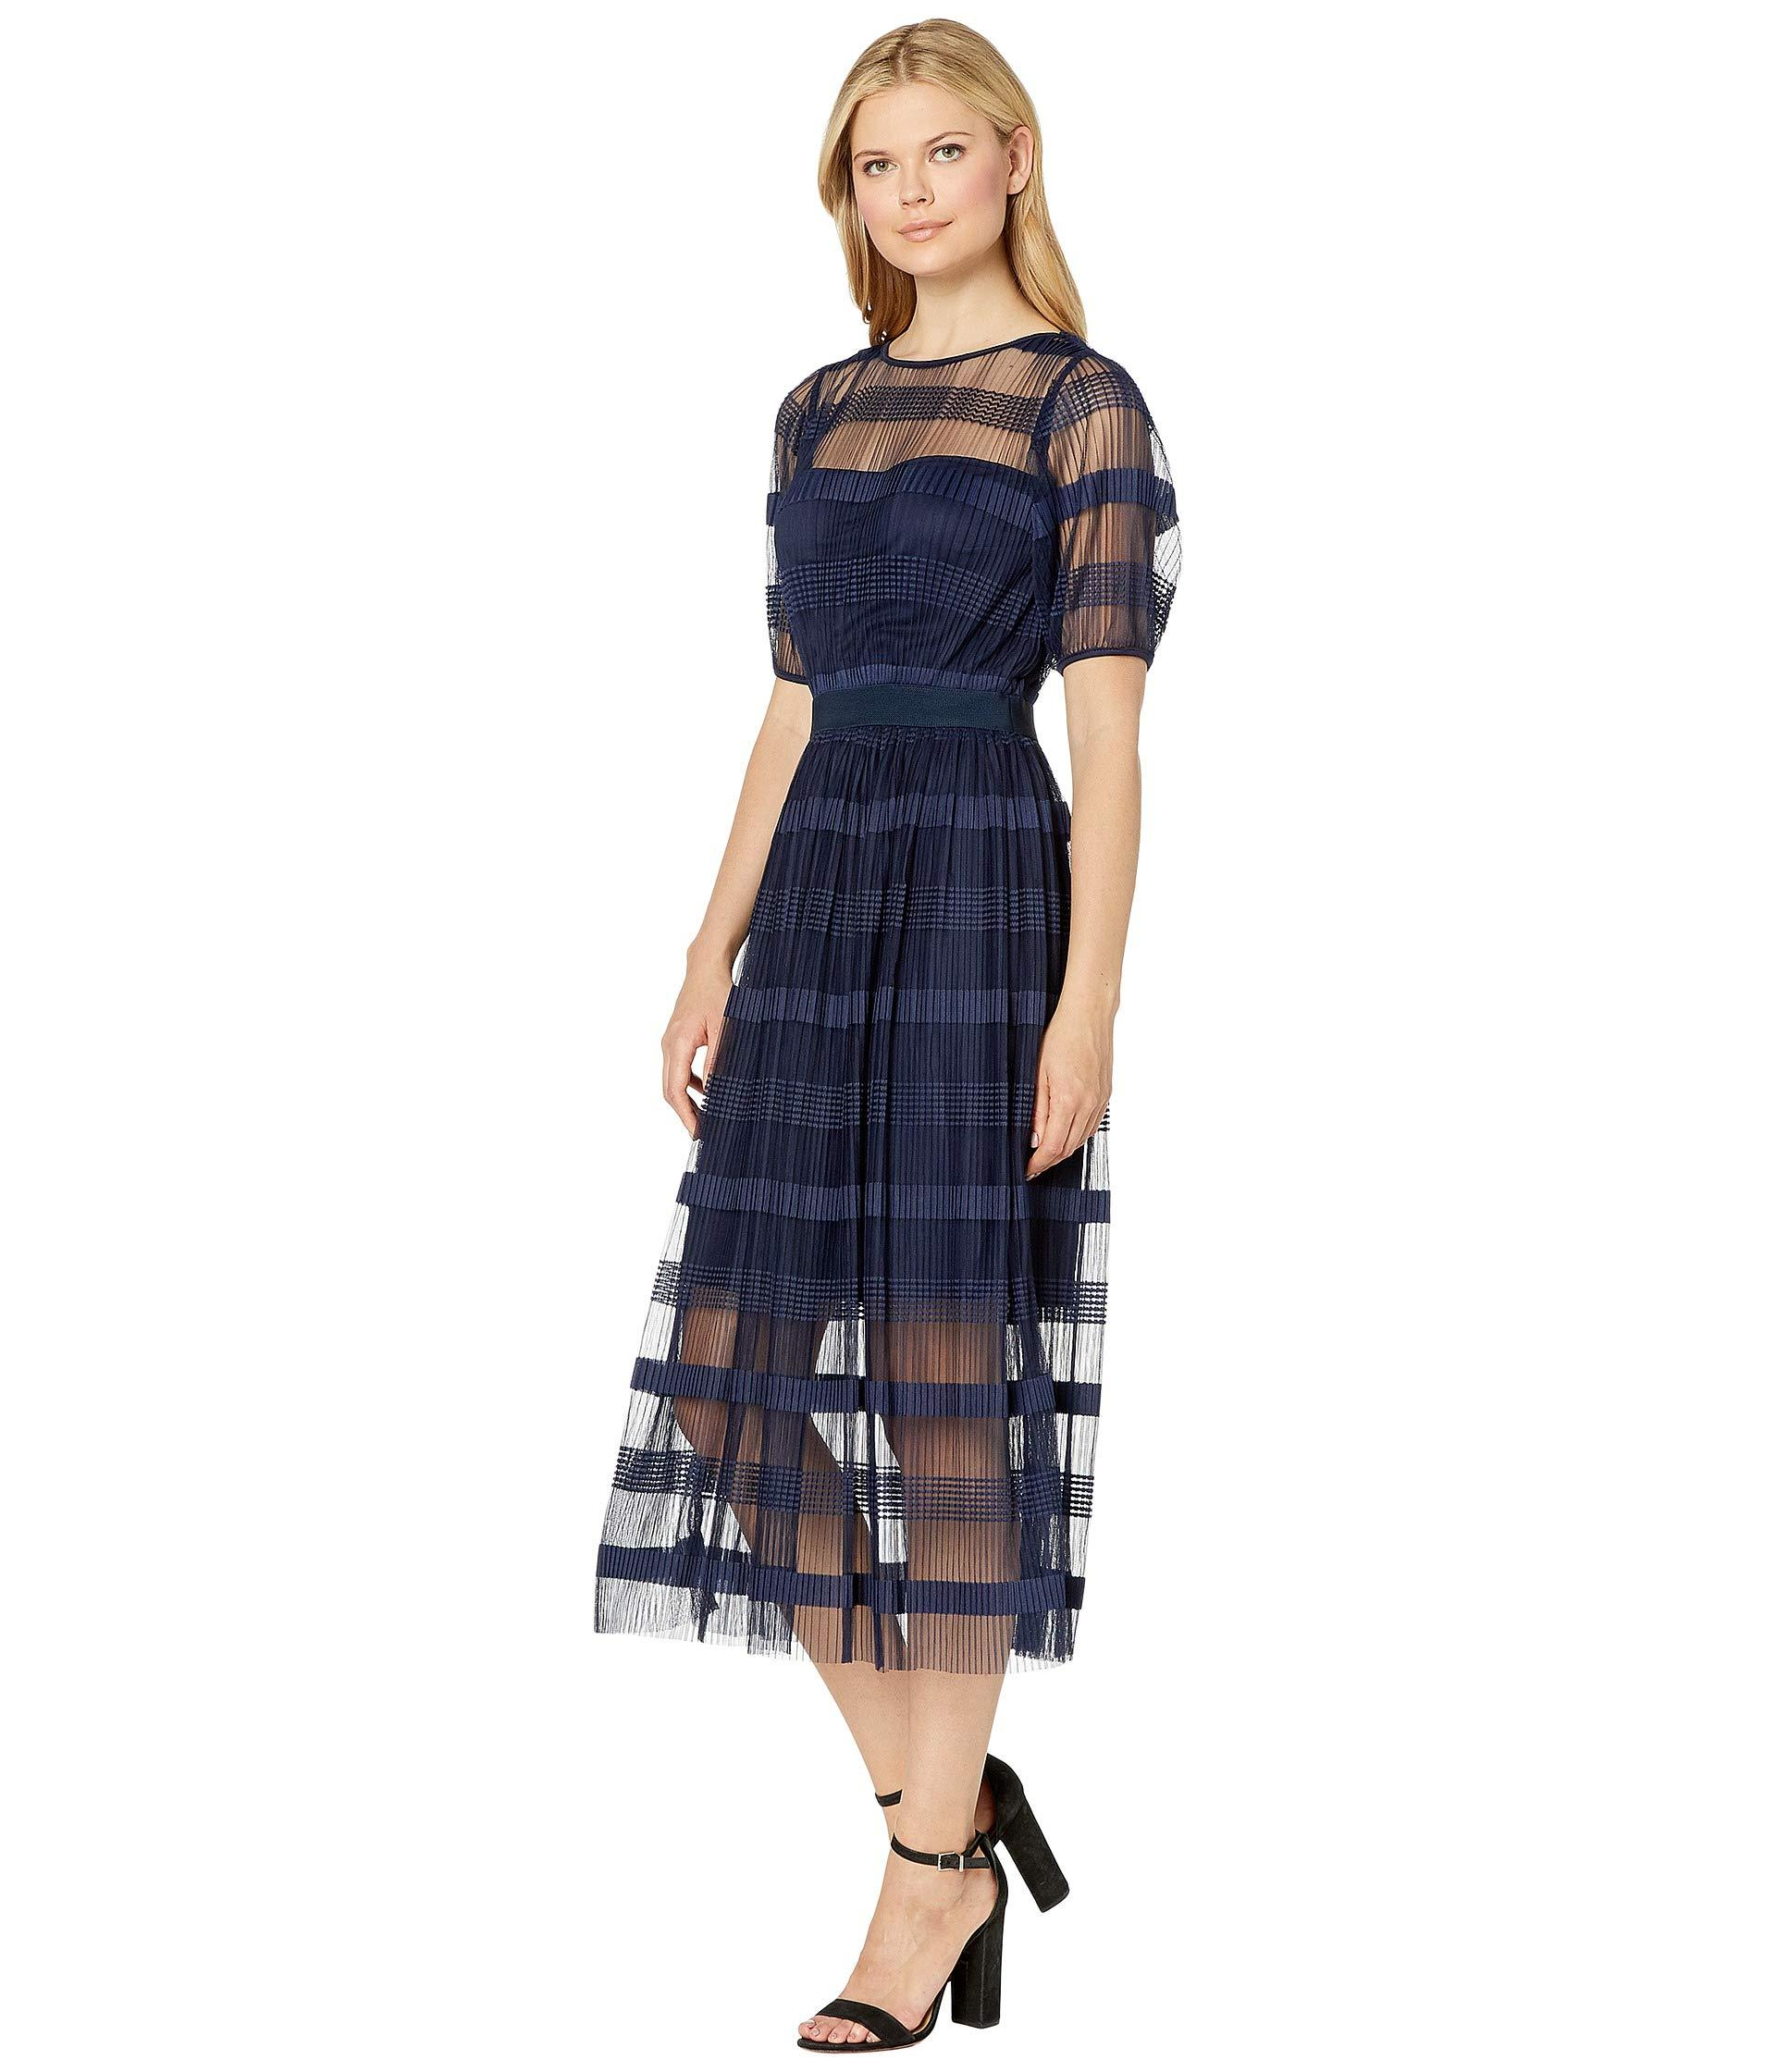 cb63654fd1 Eci Pleated Maxi Dress W  Short Sleeve in Blue - Save 9% - Lyst